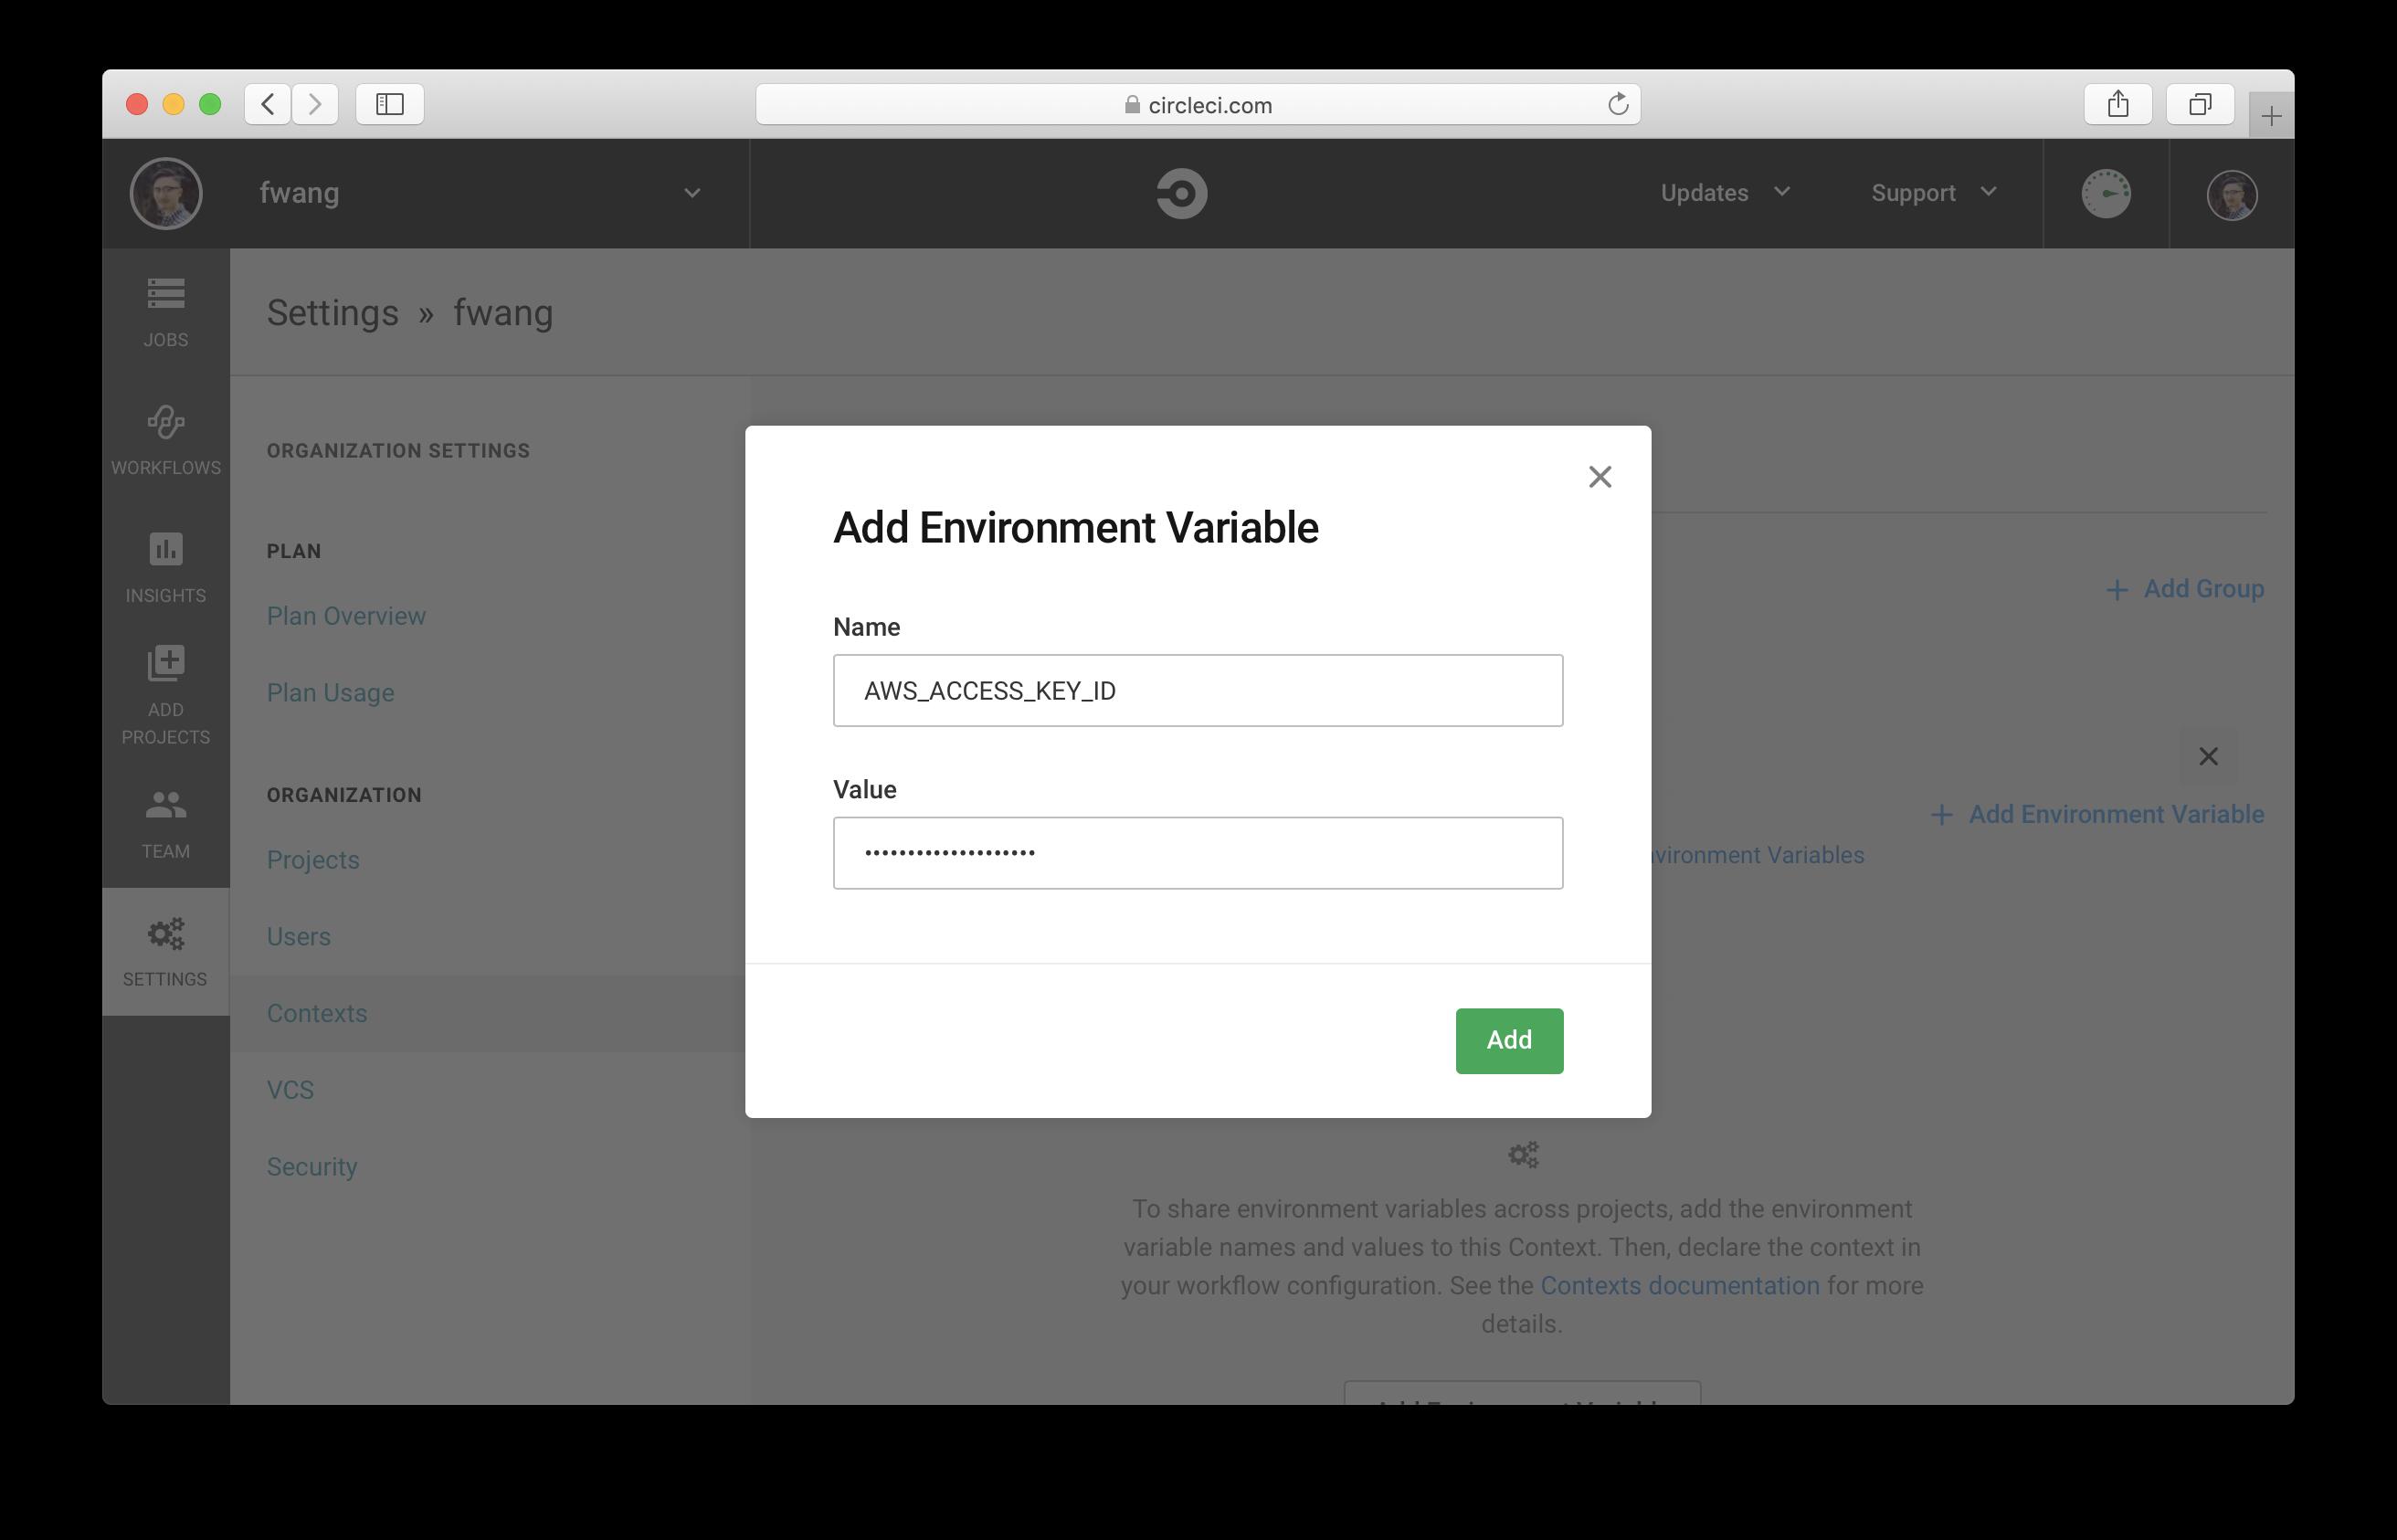 Add AWS Access Key Id as Environment Variable in CircleCI